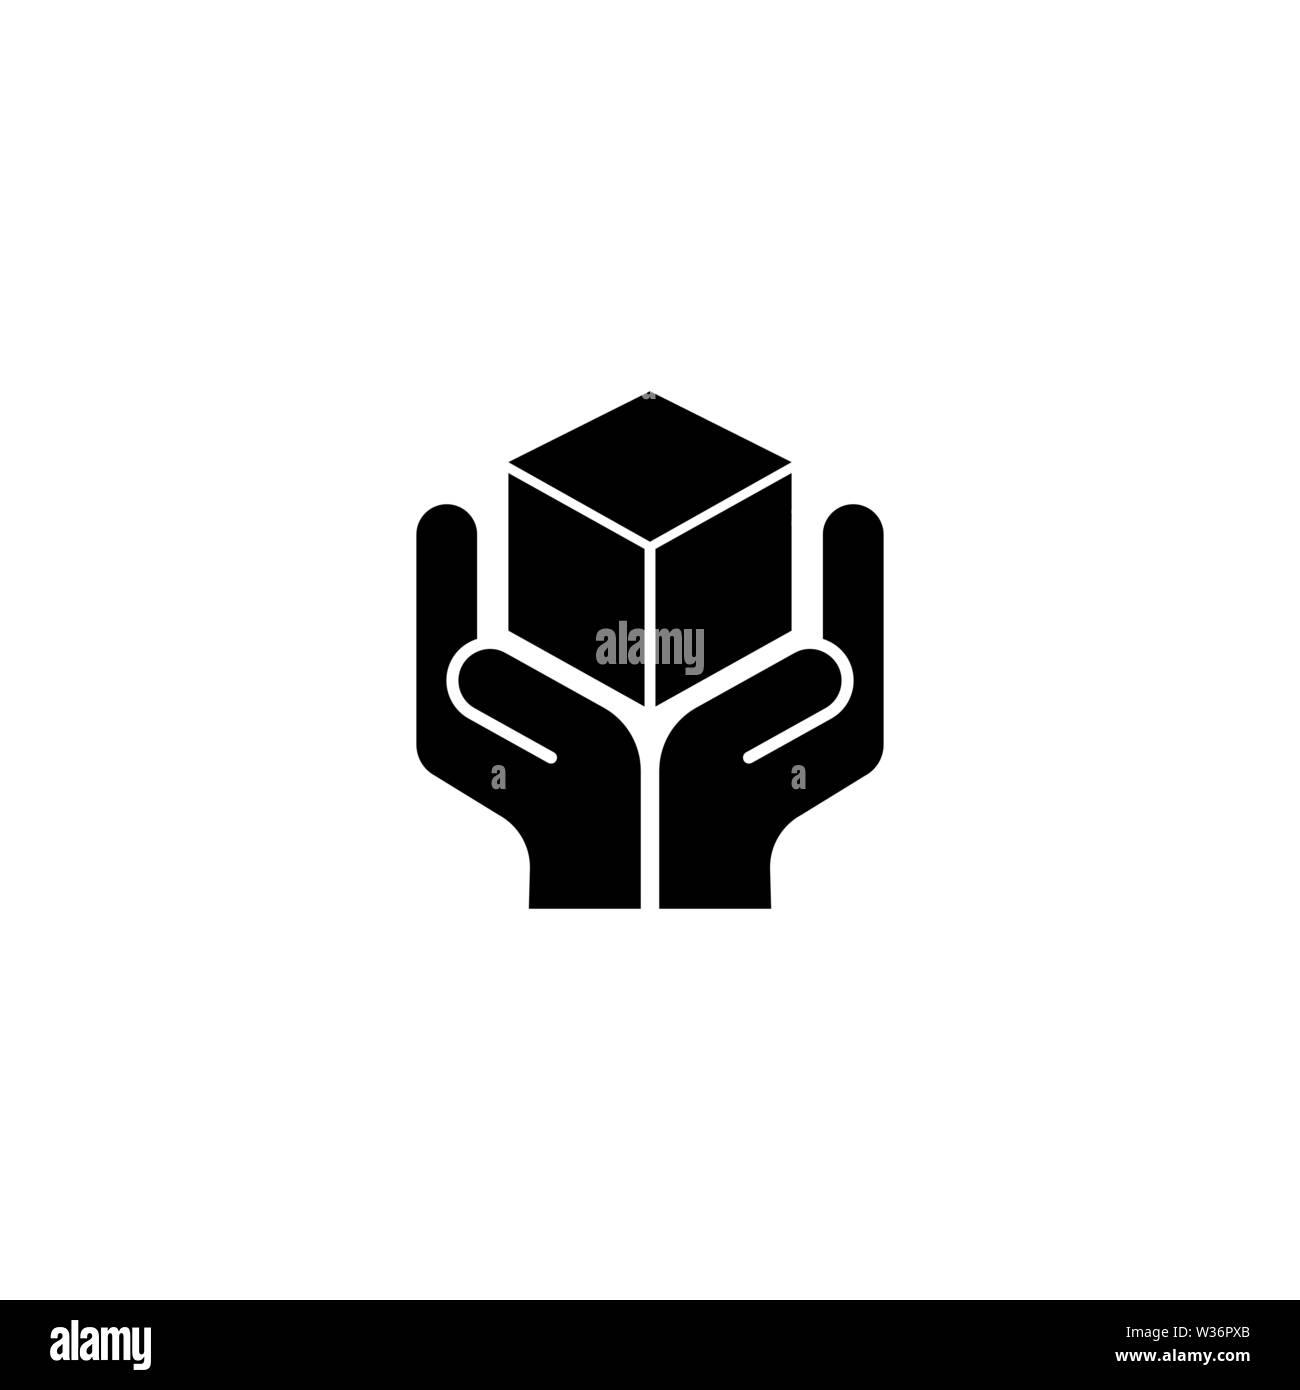 Logistics, Hand Holding Parcel. Flat Vector Icon illustration. Simple black symbol on white background. Logistics, Hand Holding Parcel sign design tem - Stock Image